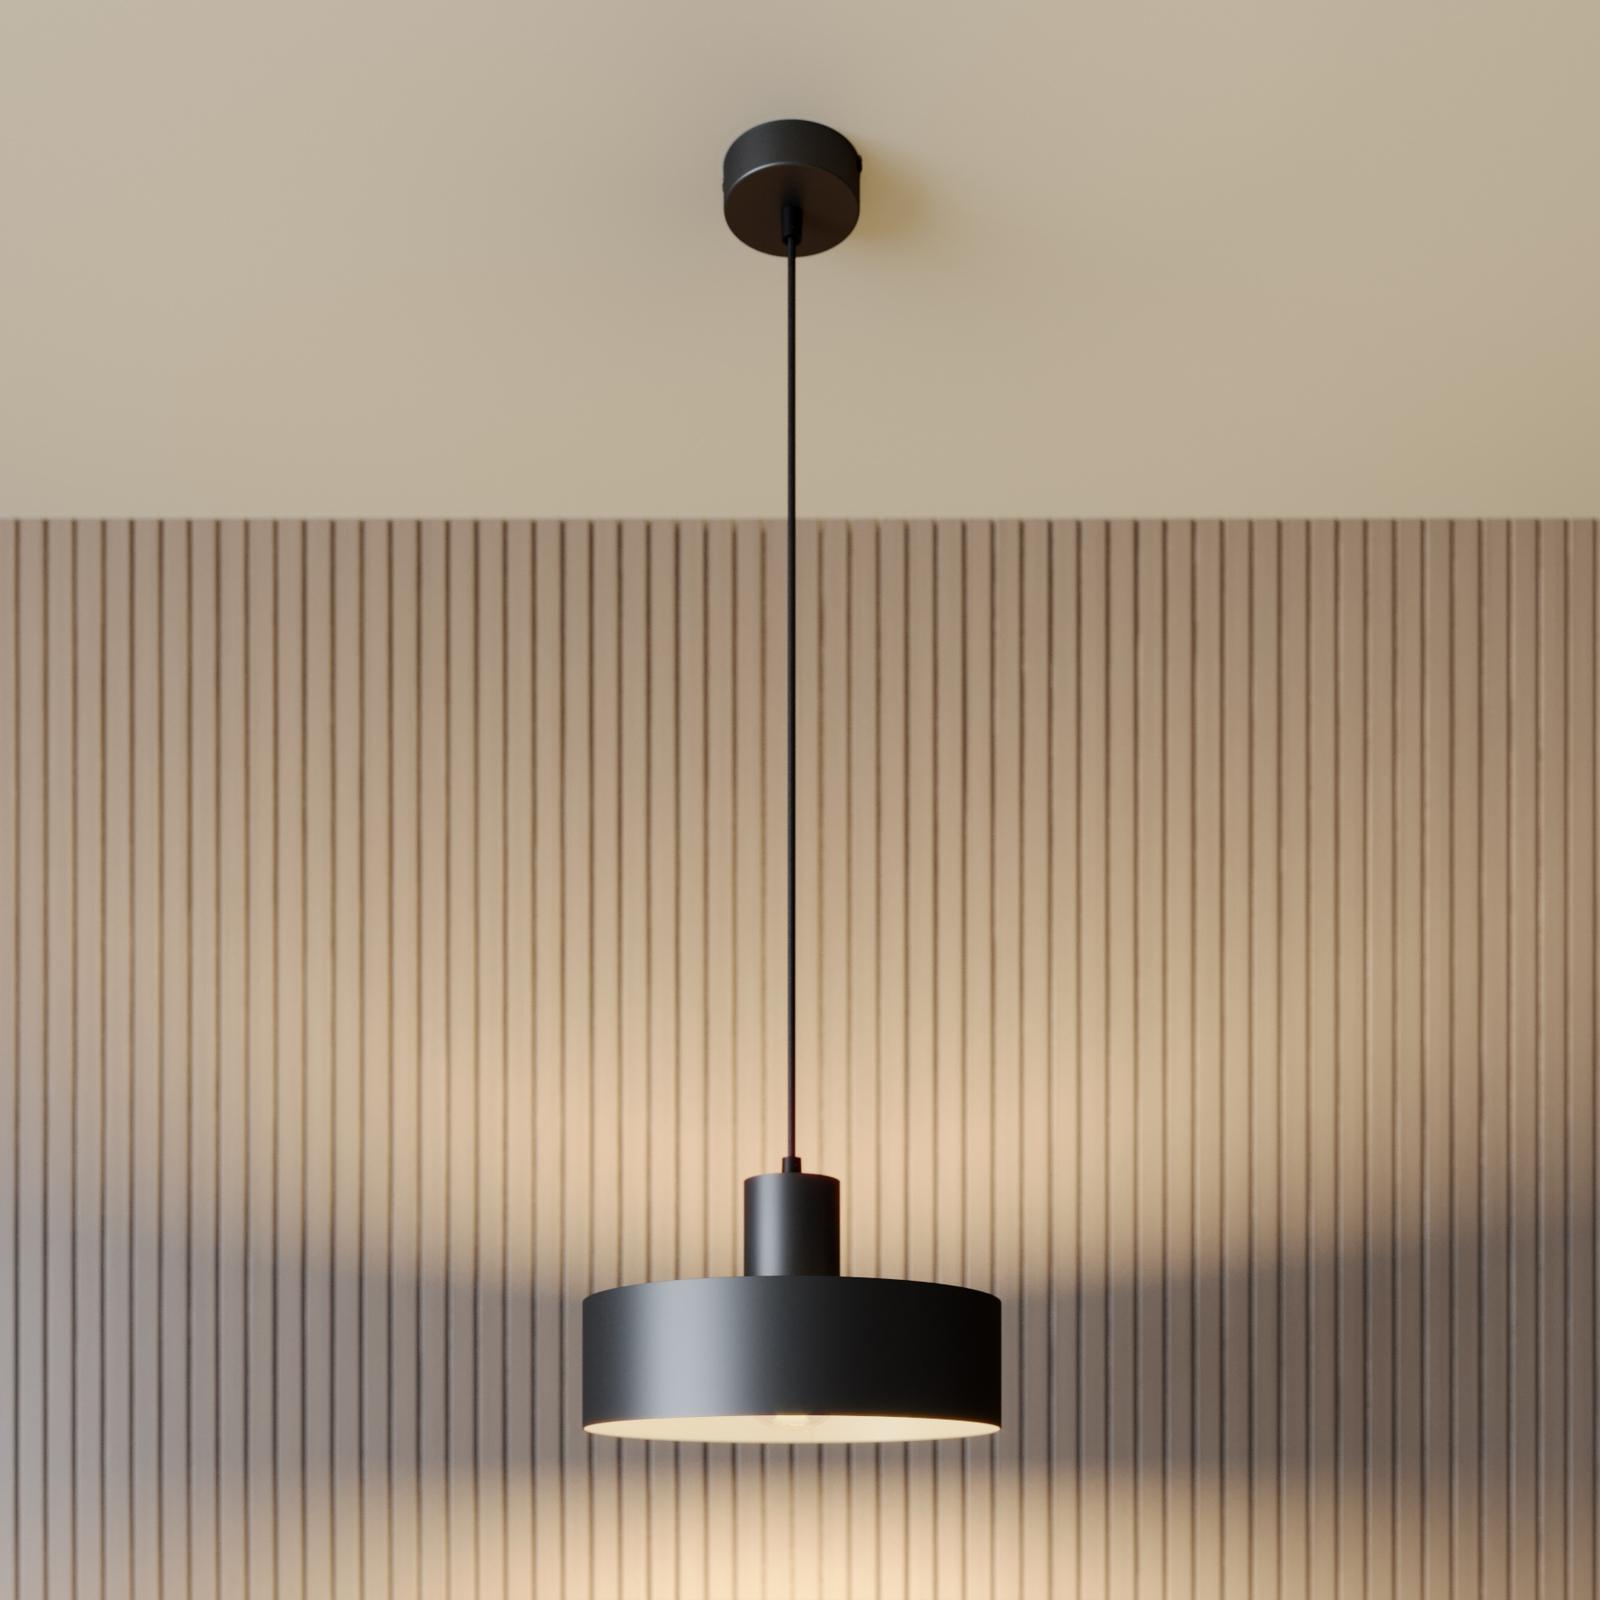 Lampa wisząca Rif z metalu, czarna, Ø 25 cm